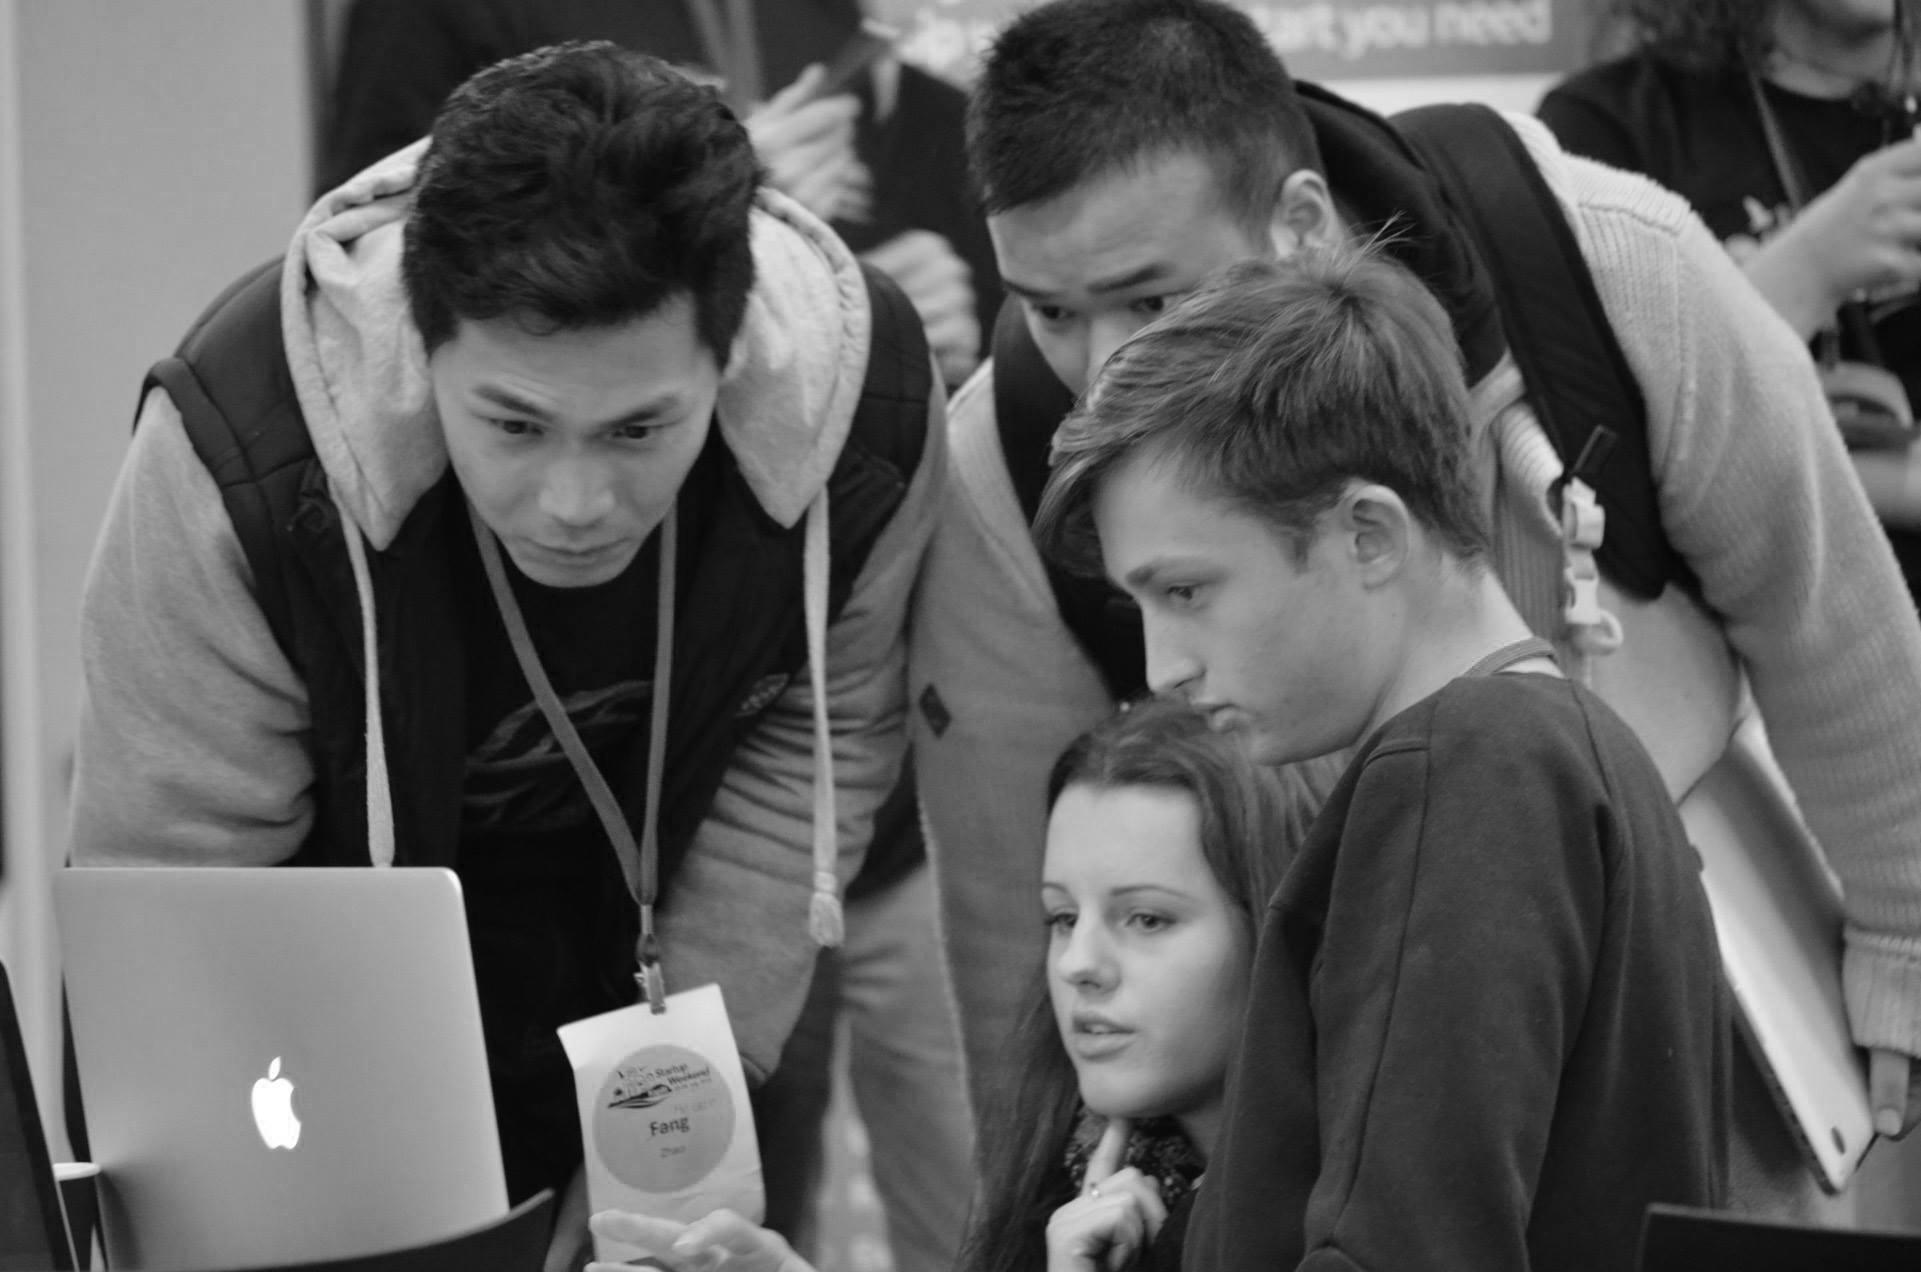 Team Working on Startup Weekend Idea